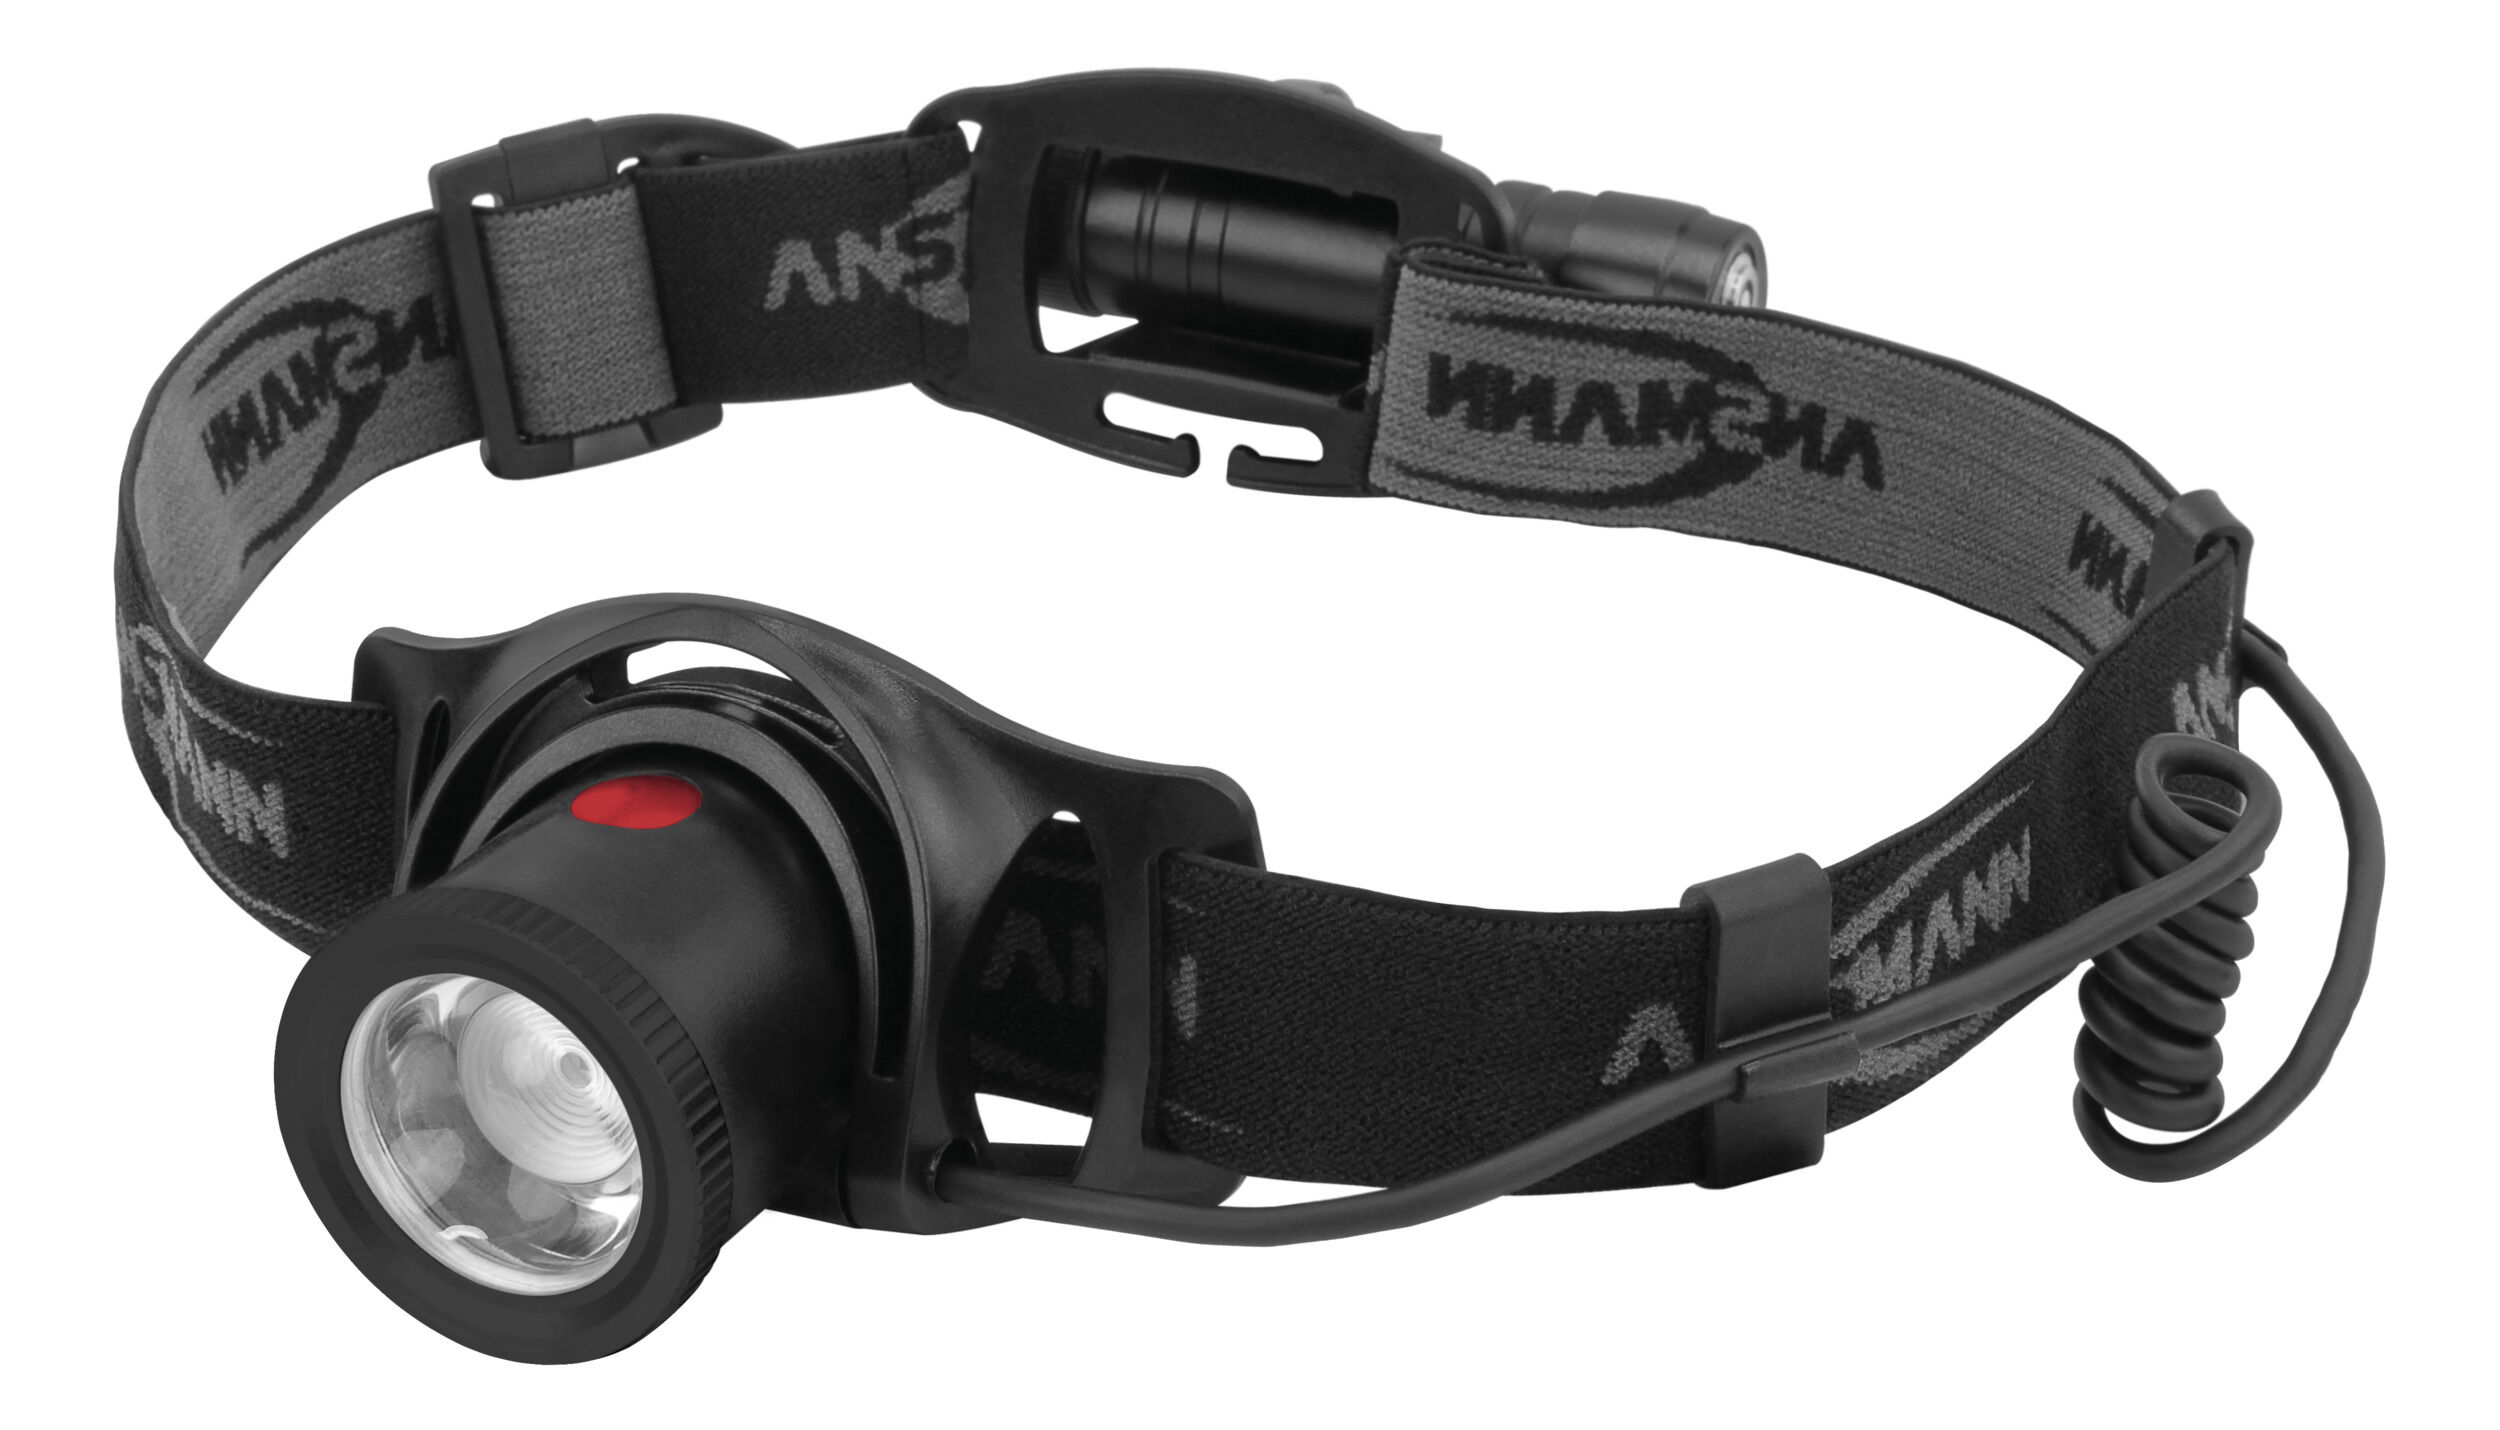 ANSMANN LED Kopflampe inkl. 18650 Li-Ion Akku 550 Lumen - Stirnlampe HD500R